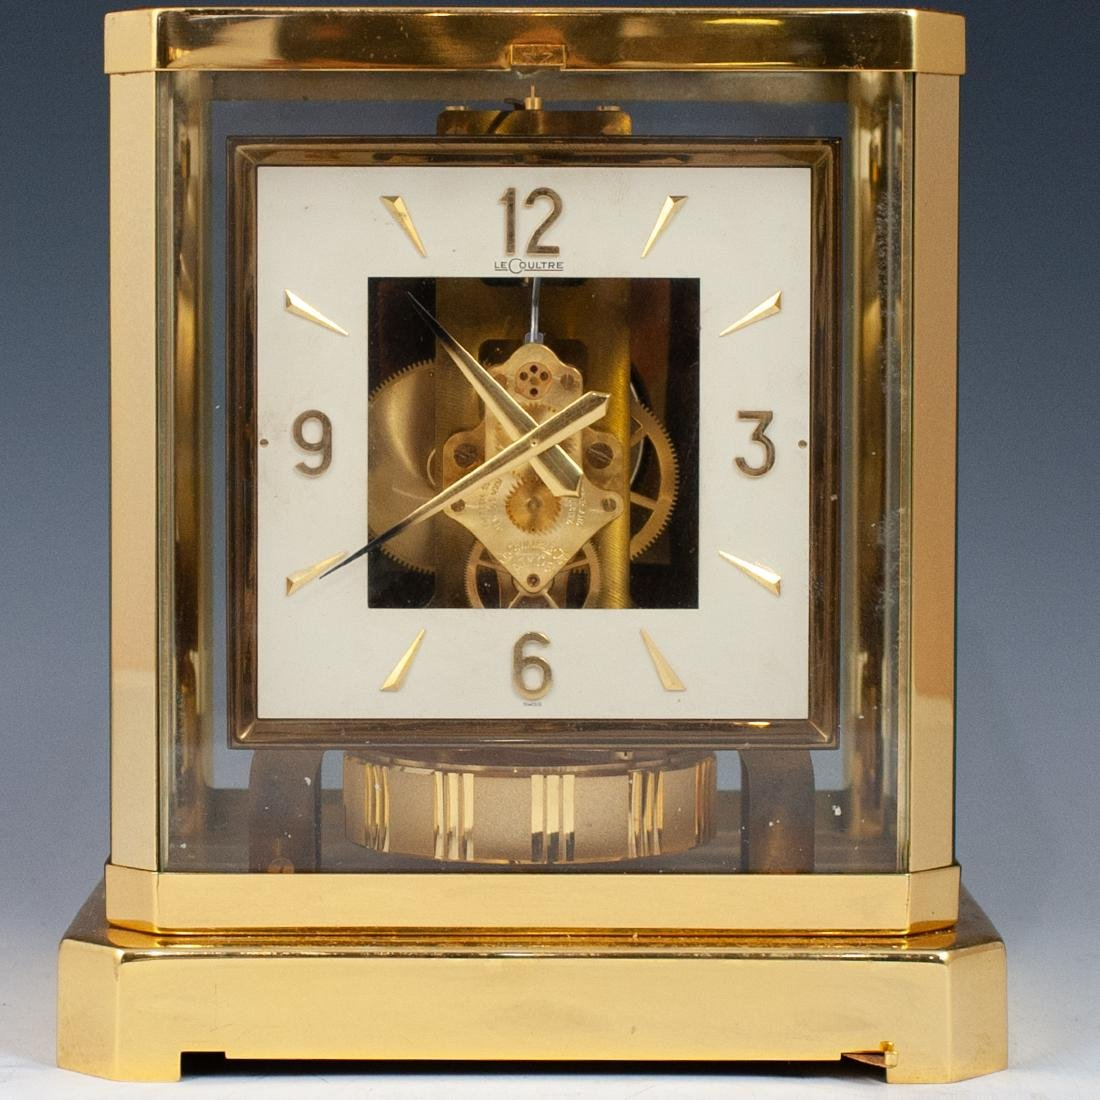 Lecoultre Atmos Perpetual Motion Clock